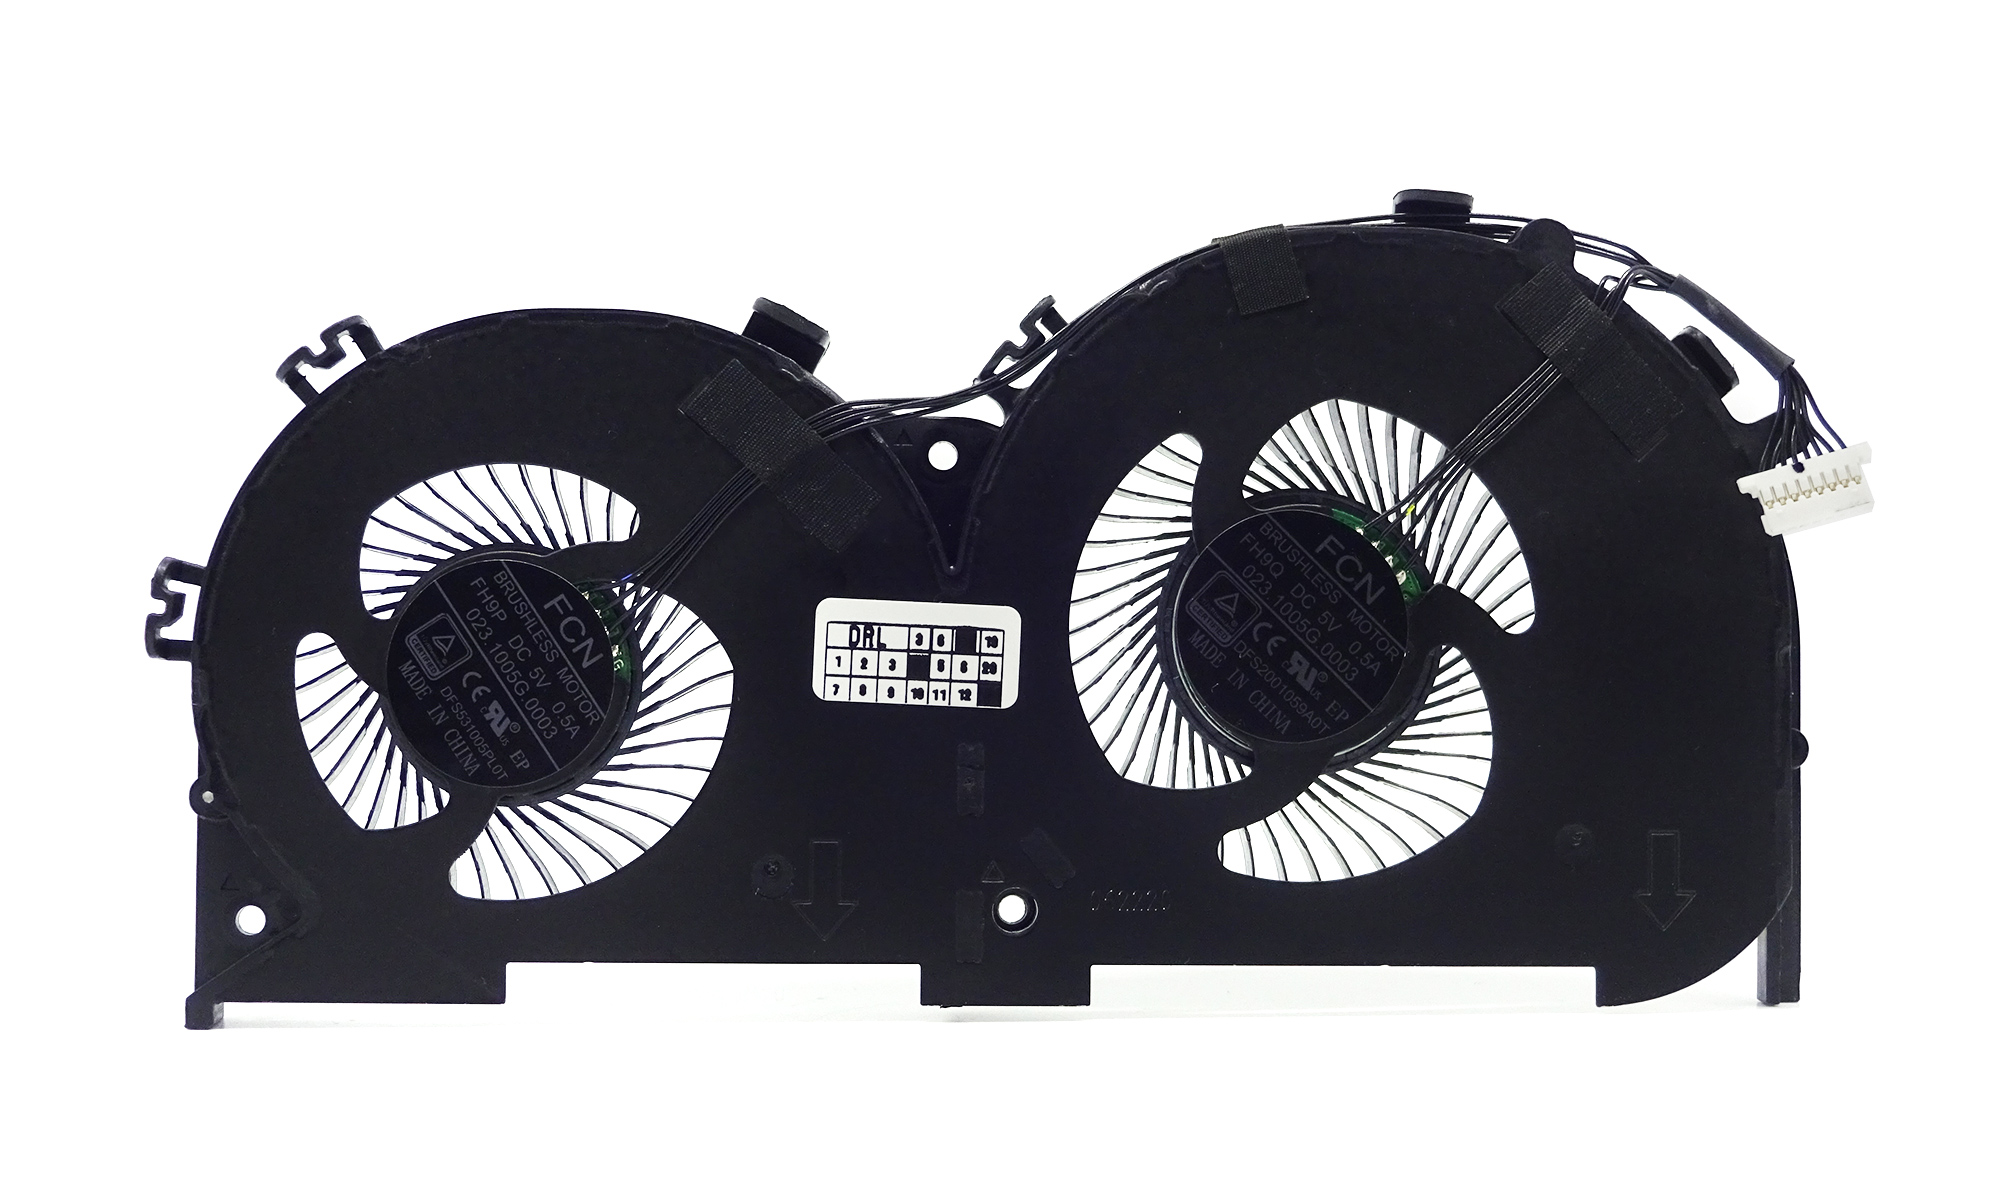 Sistem ventilatoare compatibil Lenovo Ideapad 700-15ISK, 700-17ISK